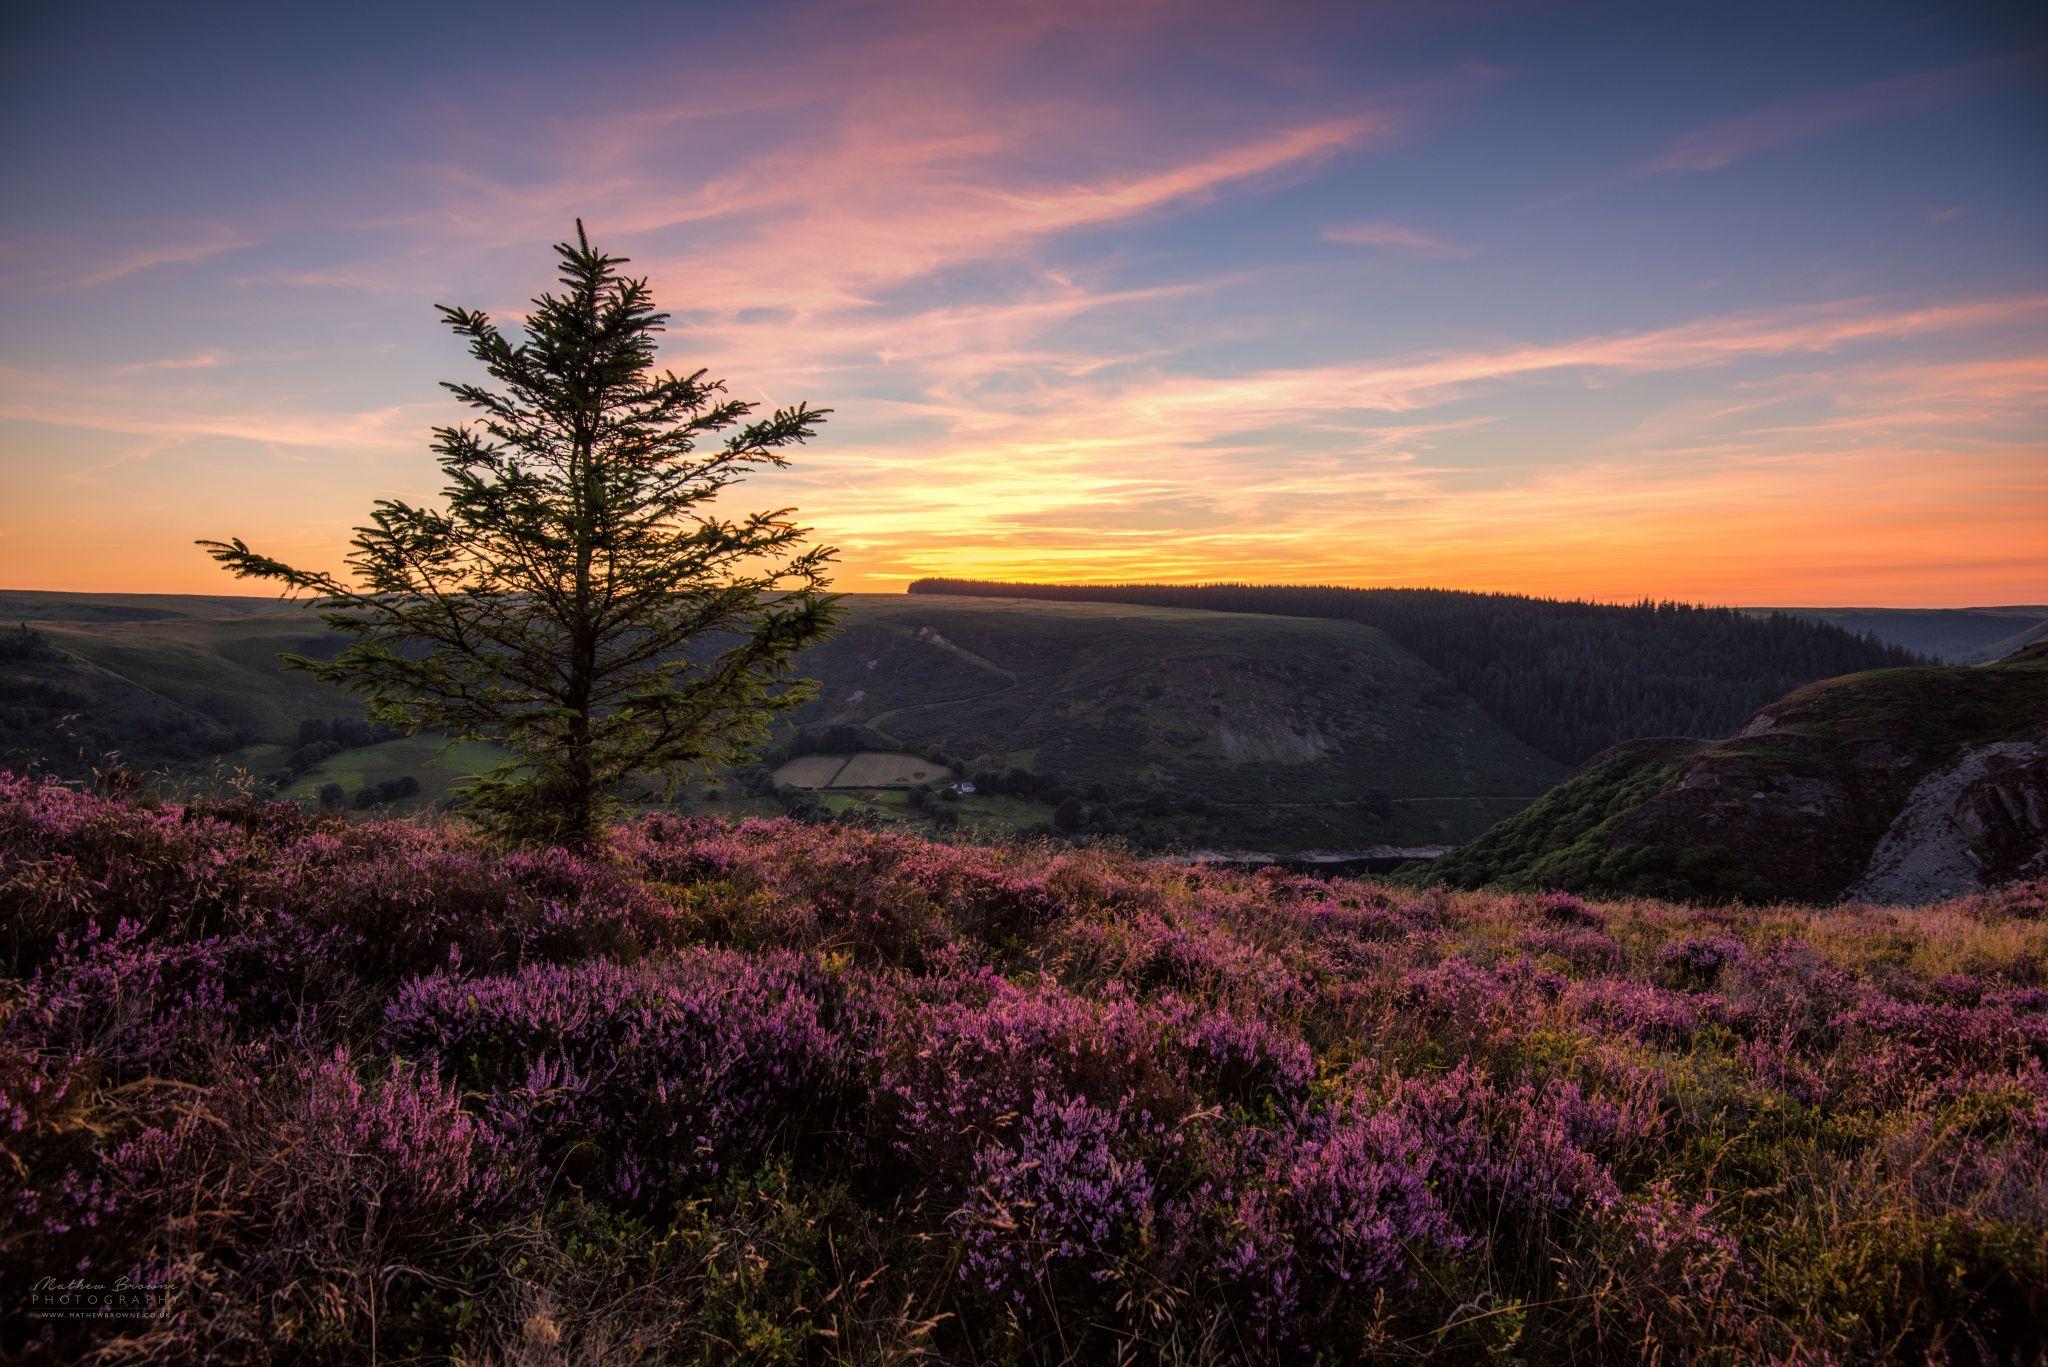 Garreg Ddu Reservoir from the cliffs above, United Kingdom